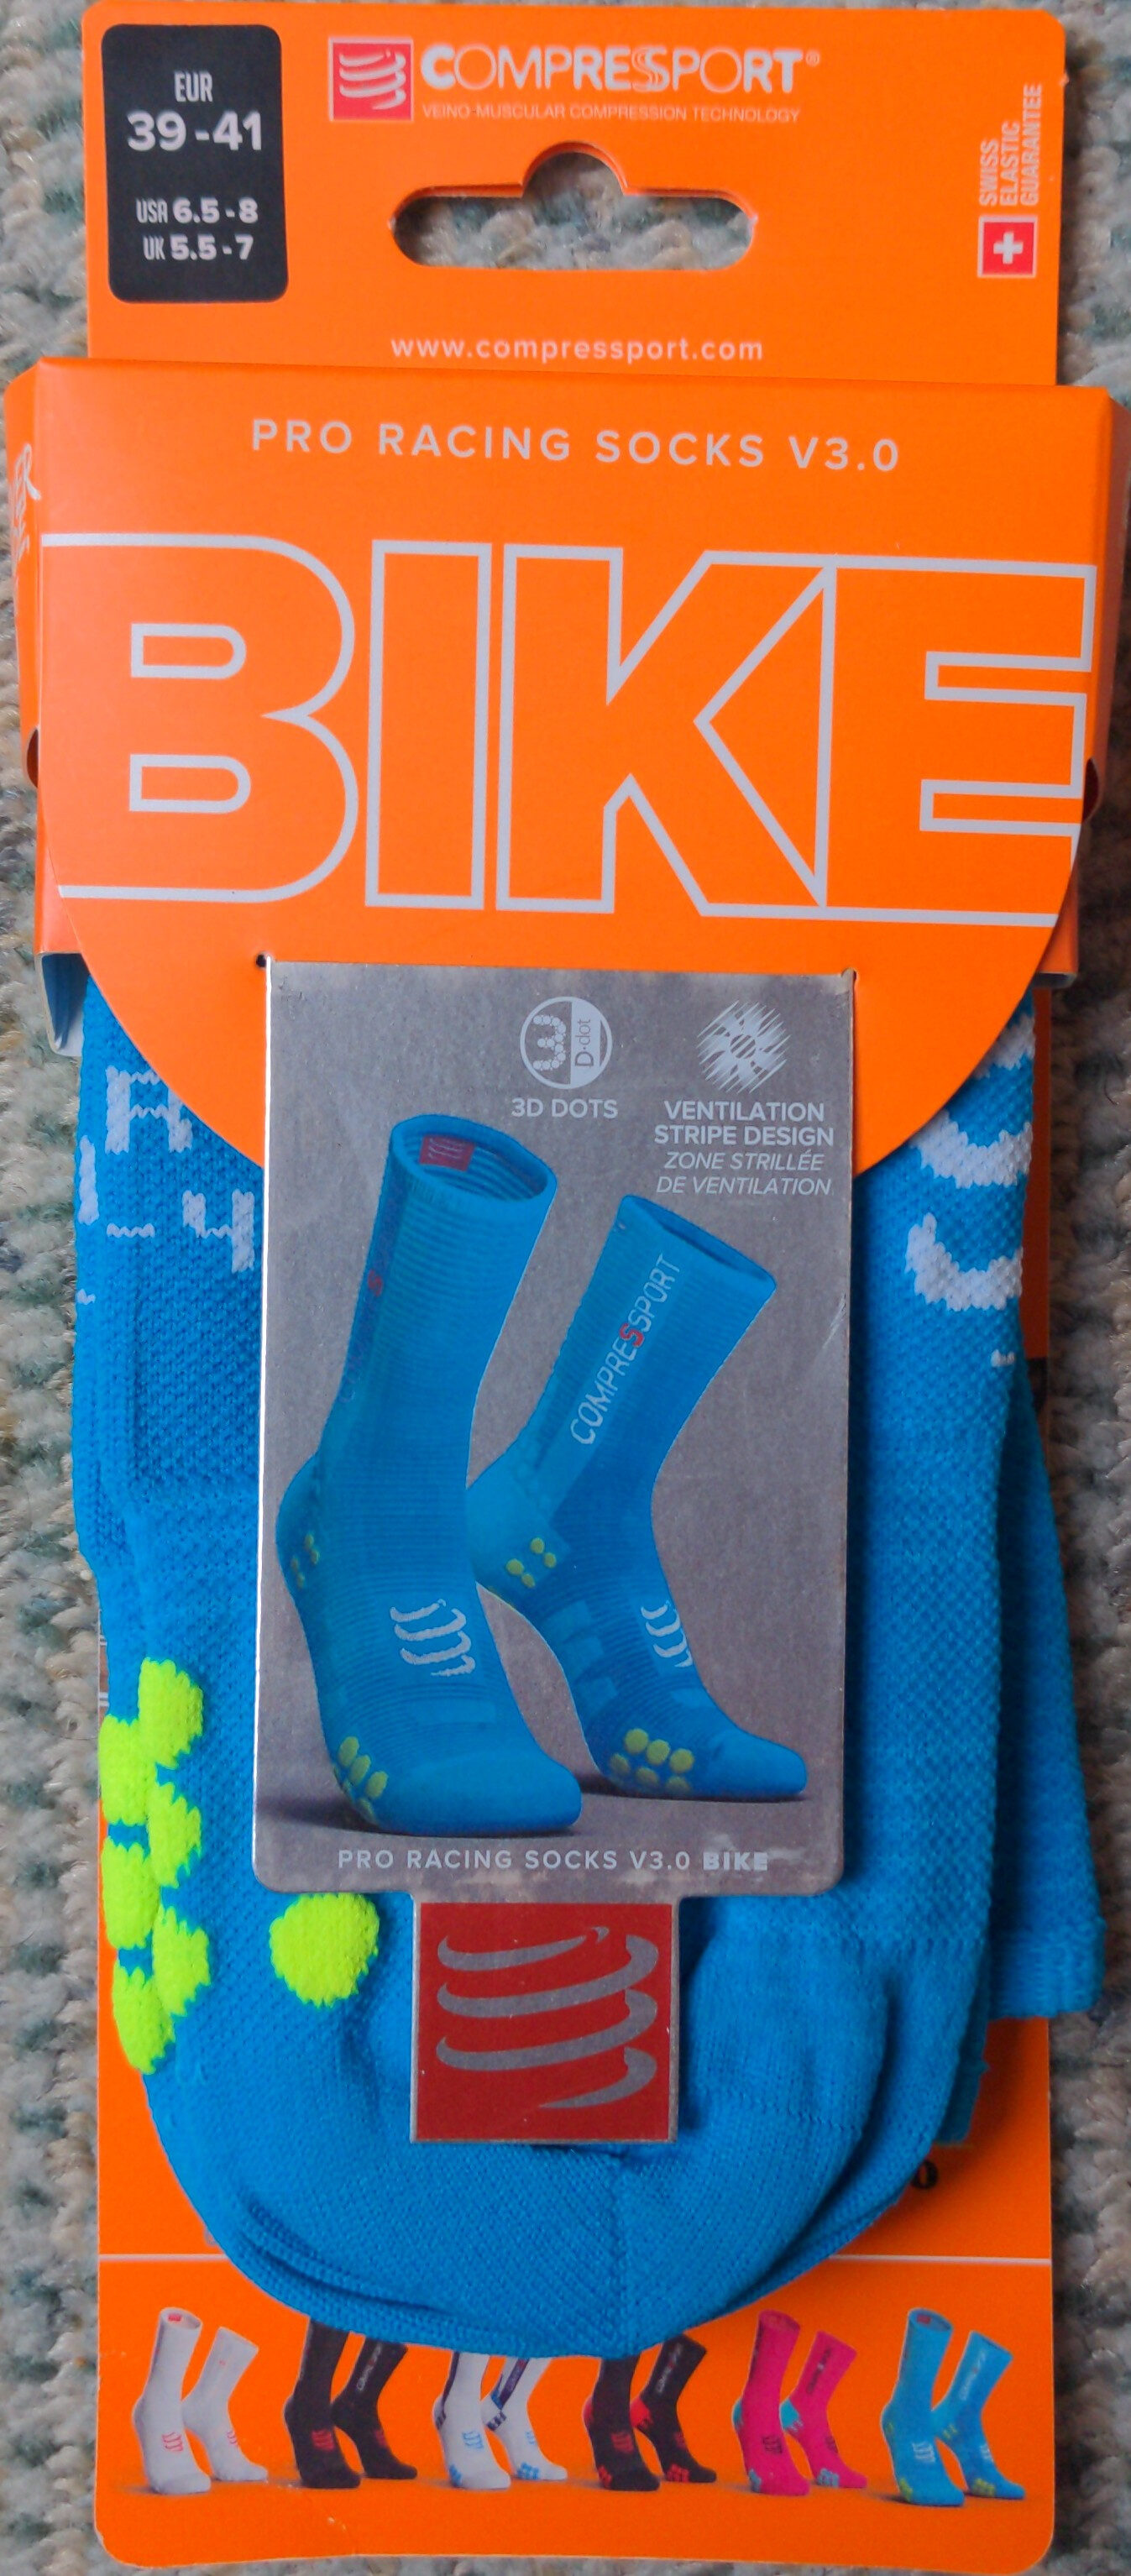 Pro racing socks 3.0 - Produit - fr